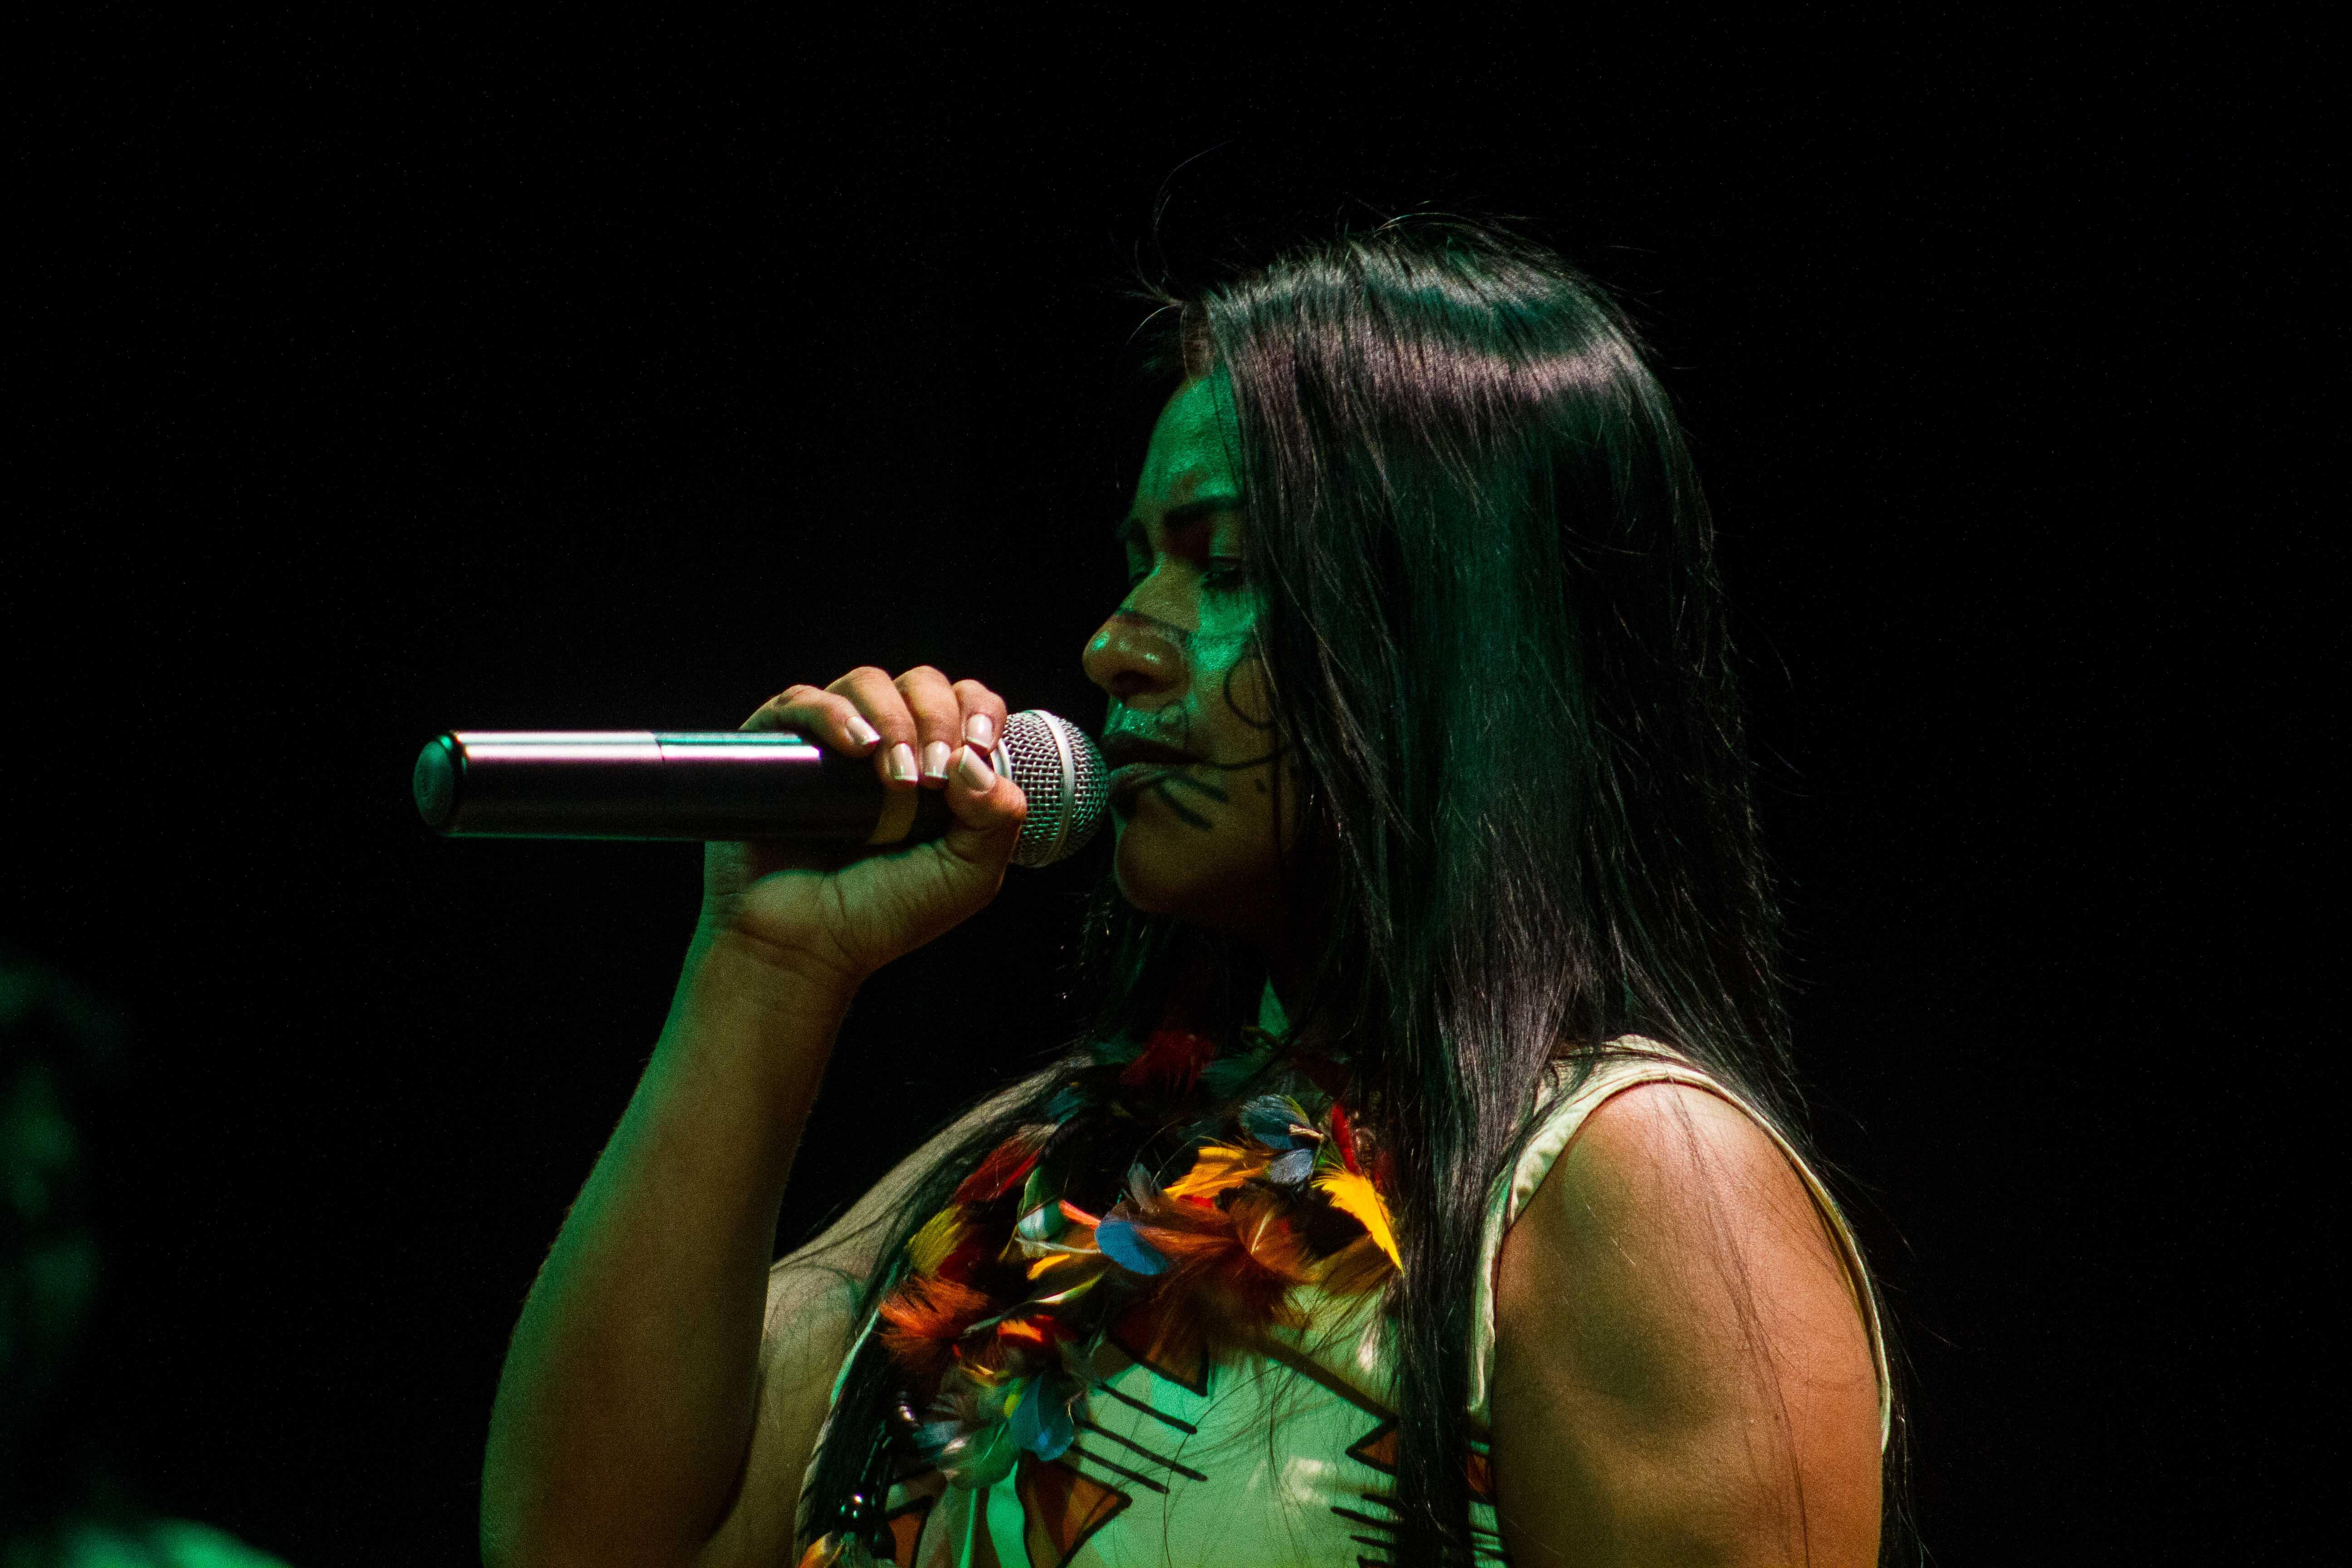 Cantora Djuena Tikuna é indicada a prêmio internacional de música indígena